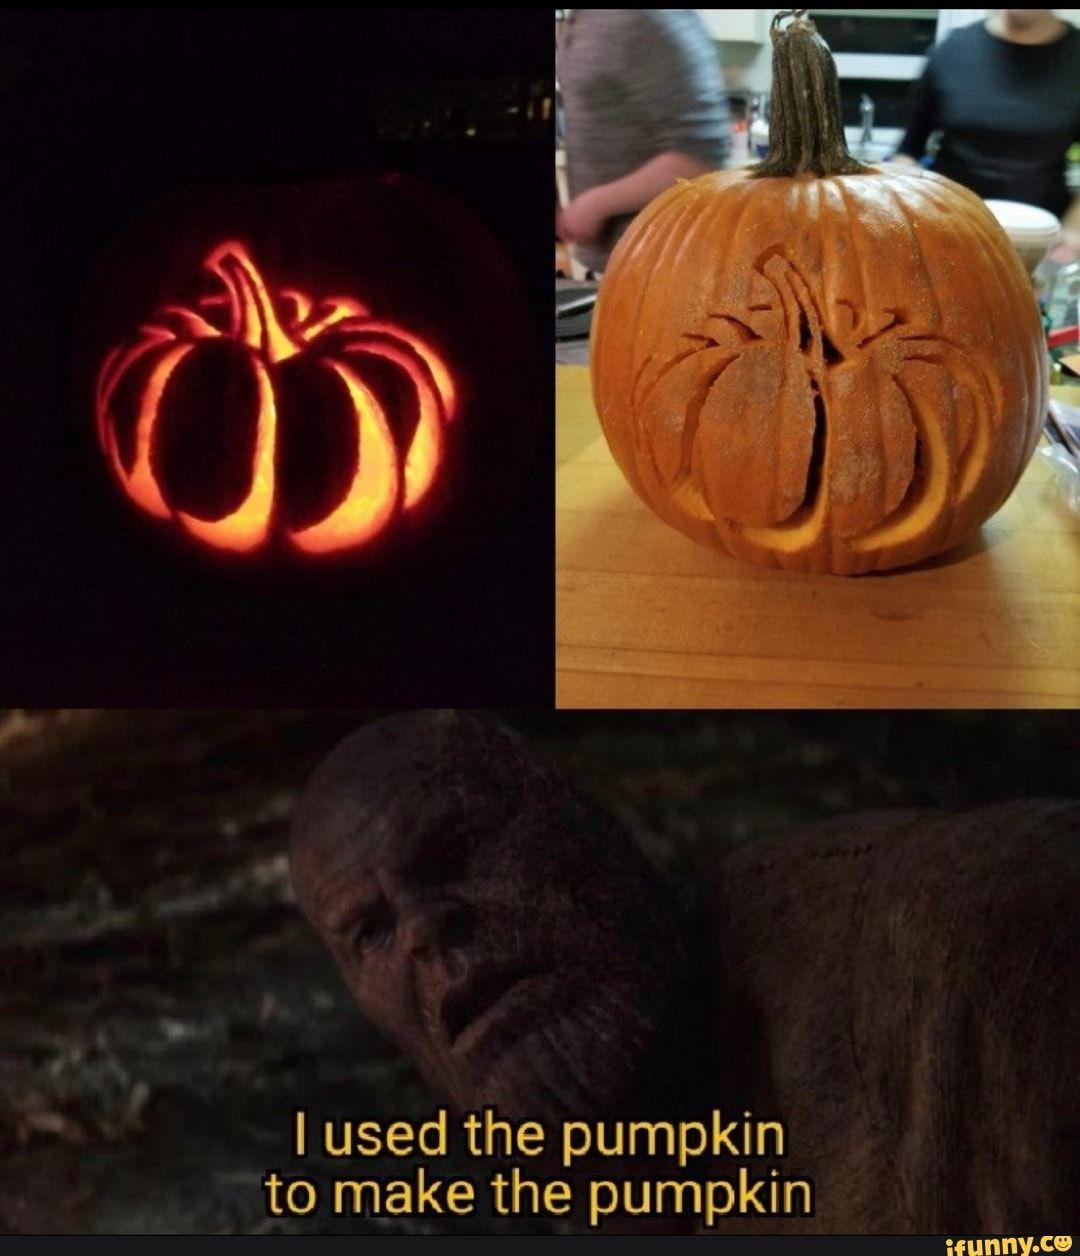 I Used The Pumpkin To Make The Pumpkin Ifunny Pumpkin Love Memes Funny Spooky Pumpkin